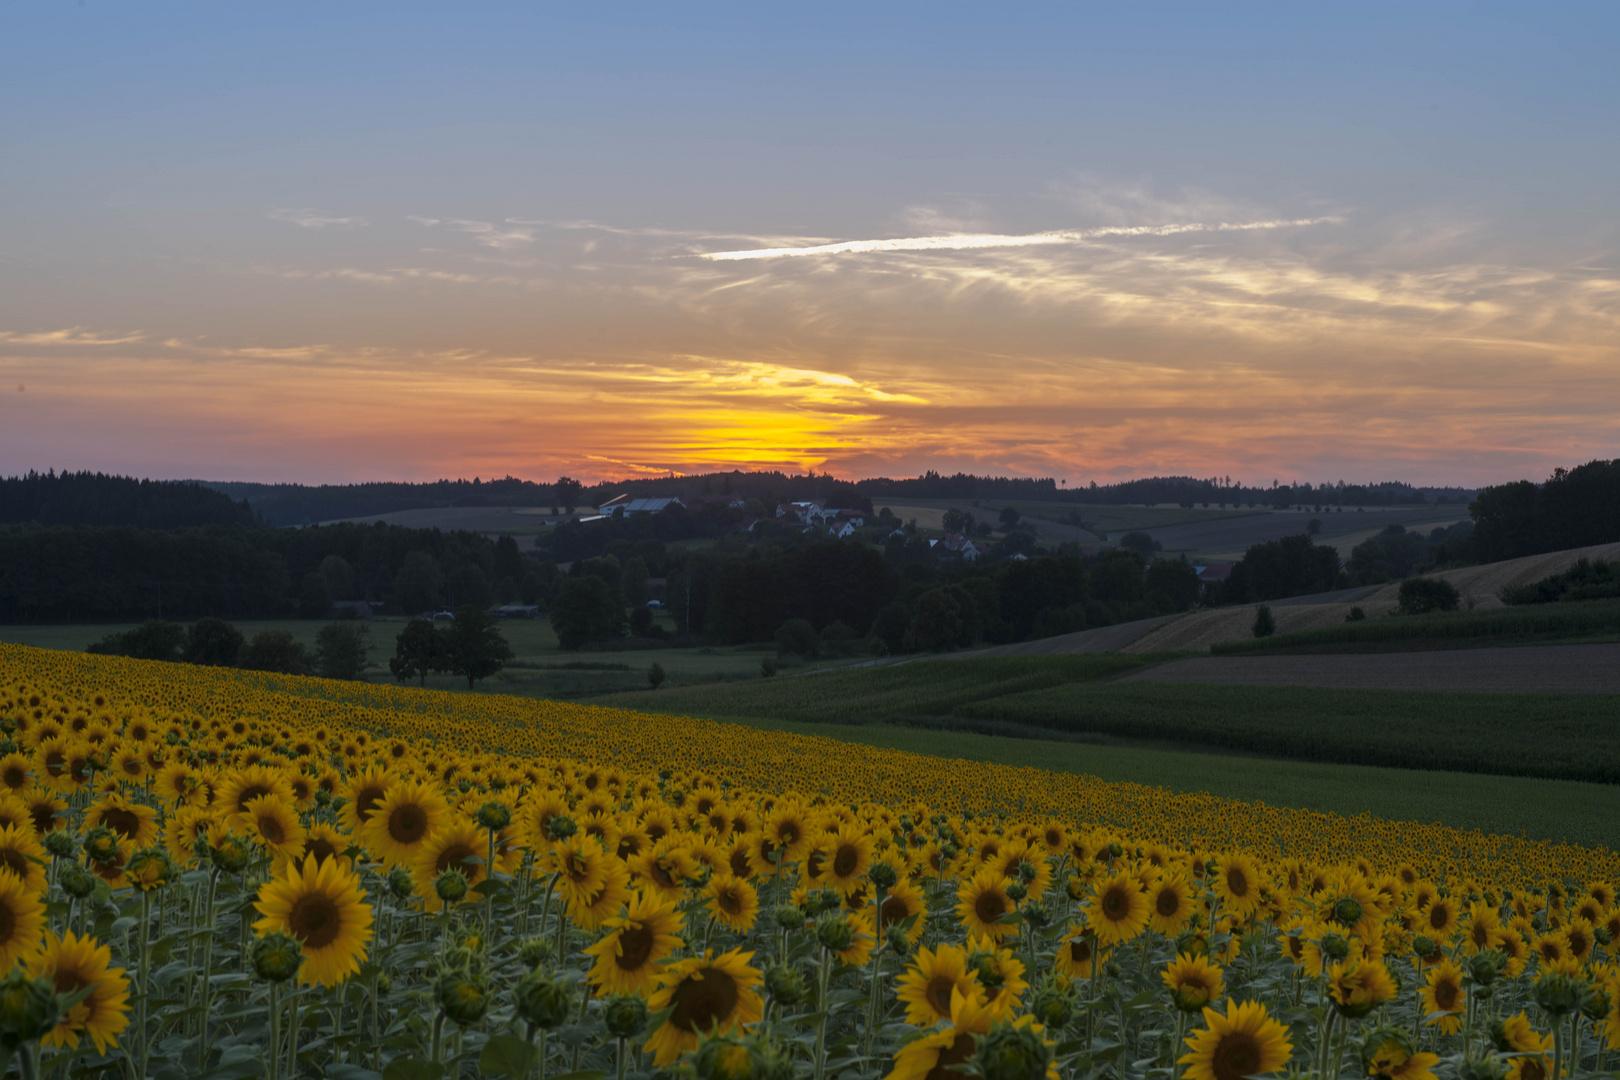 Sonnenblumenfeld im SU